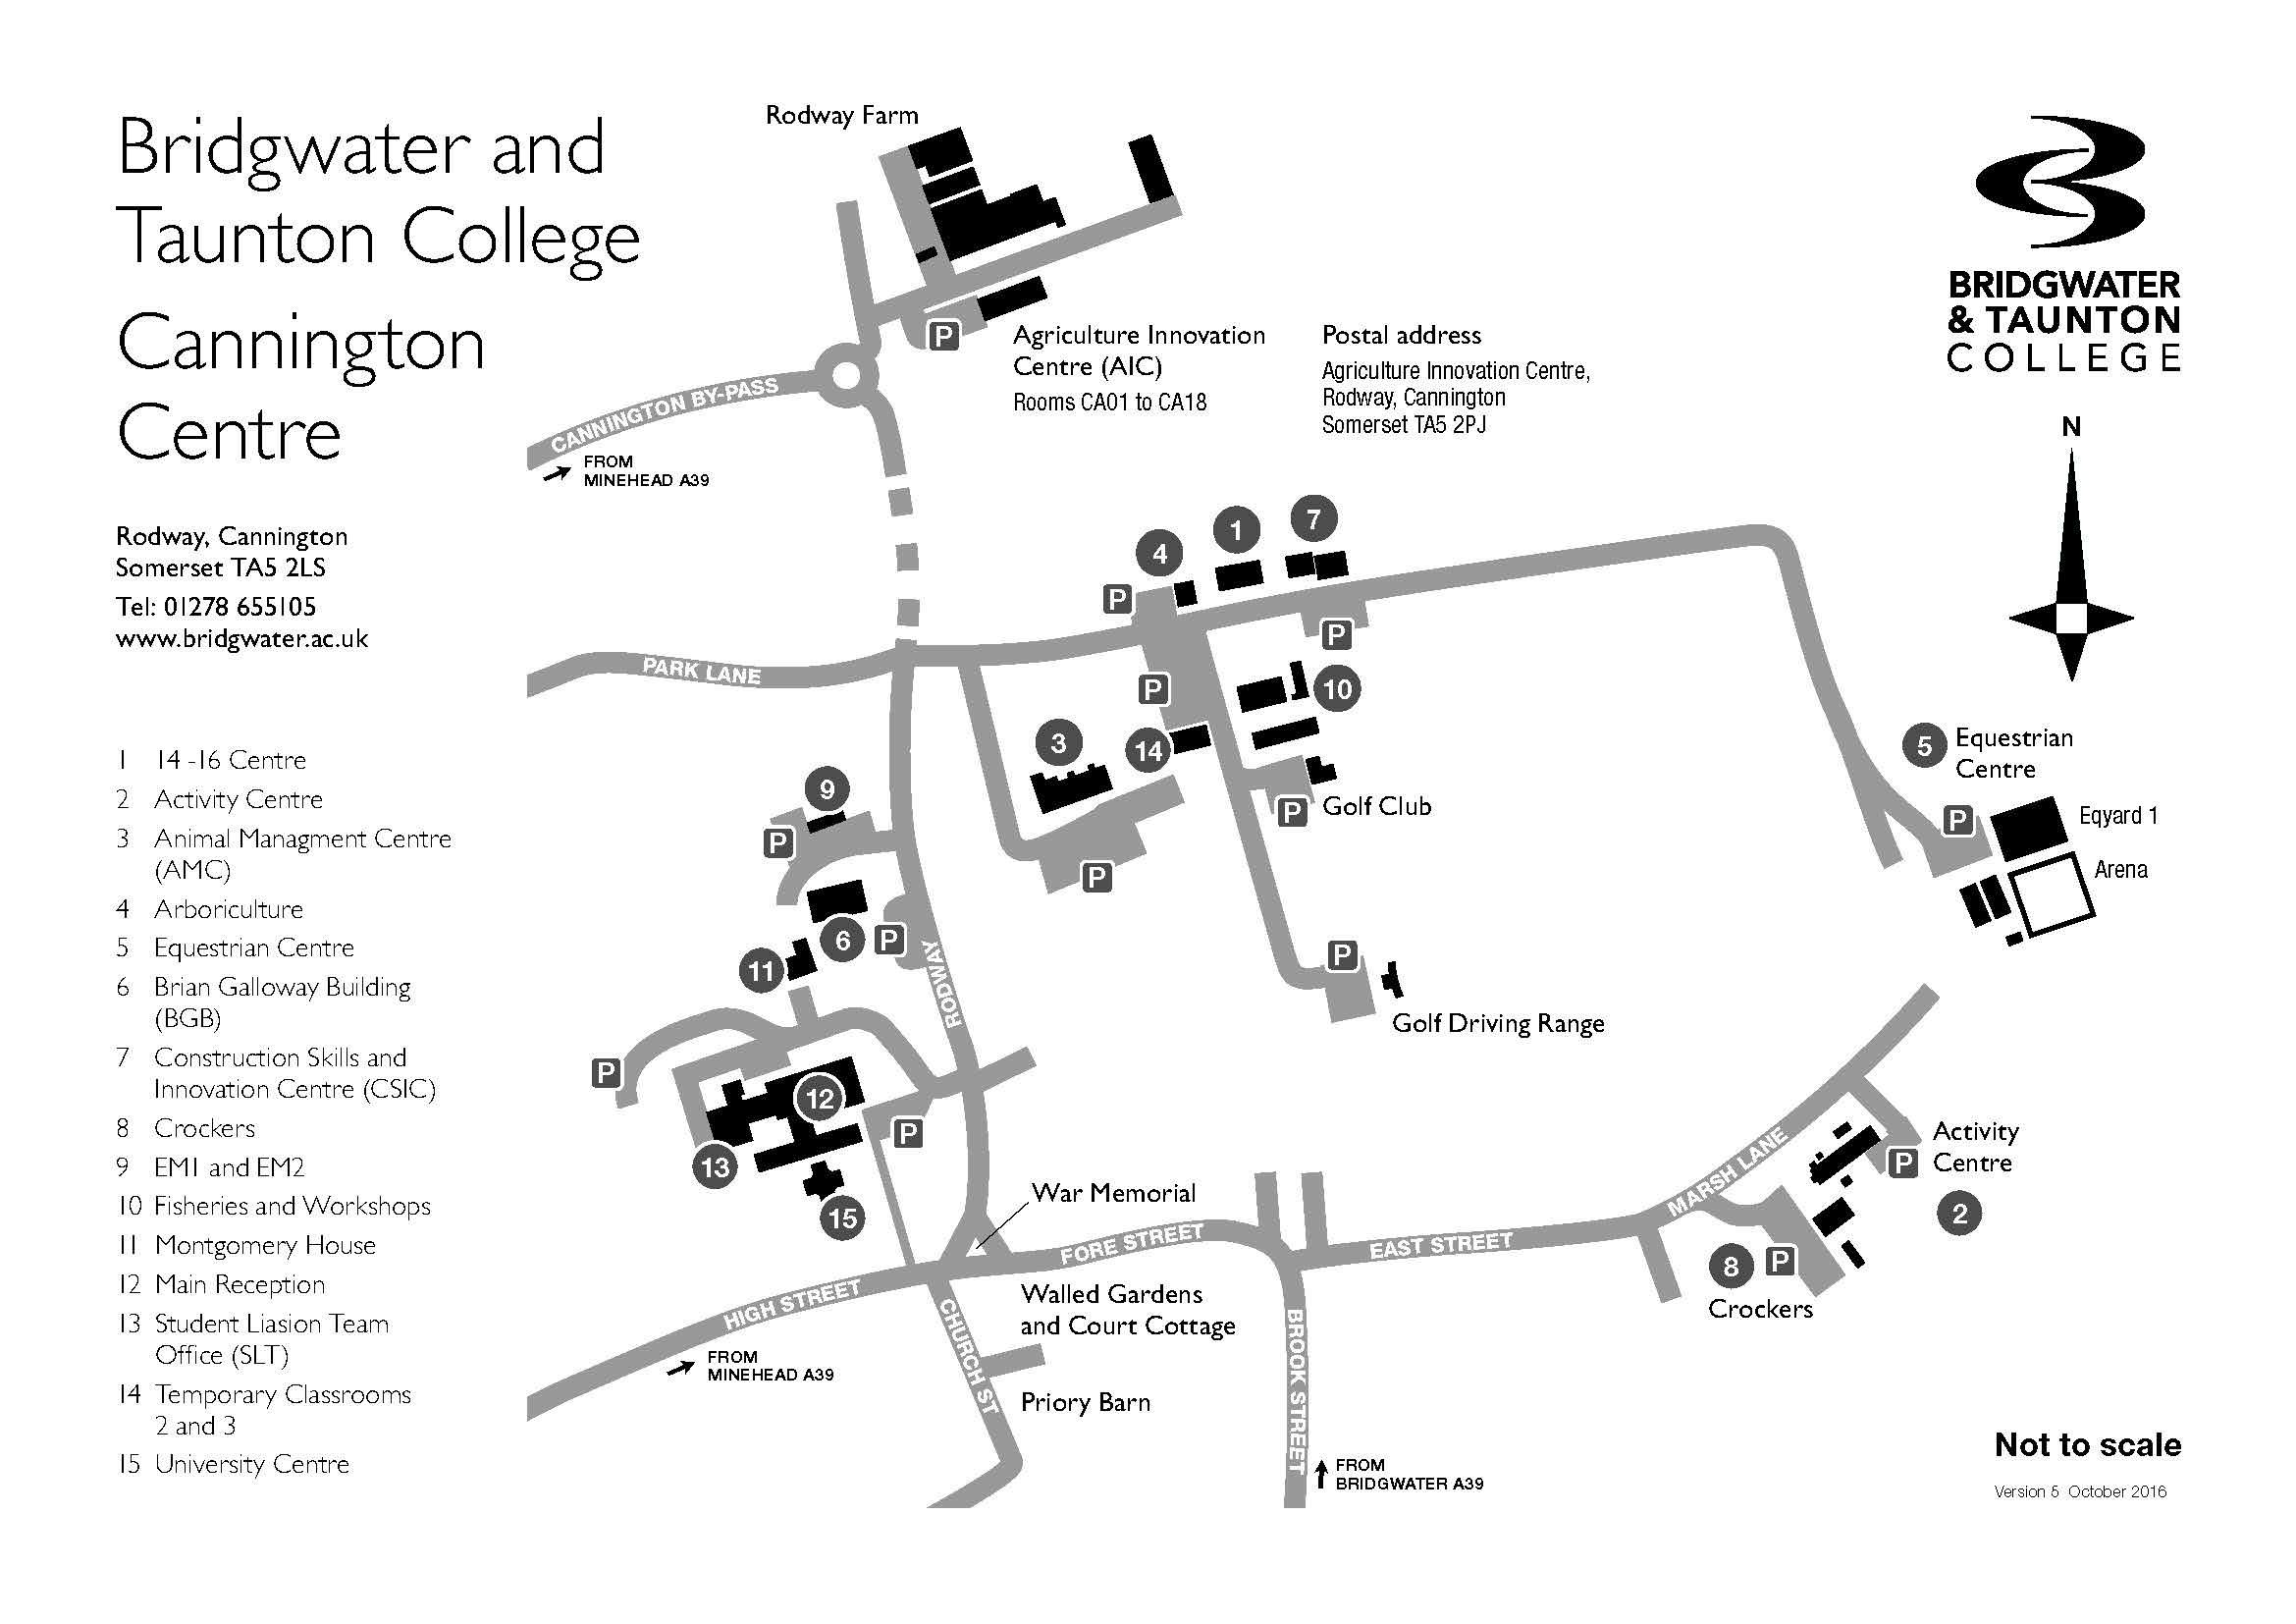 Bridgwater & Taunton College Map